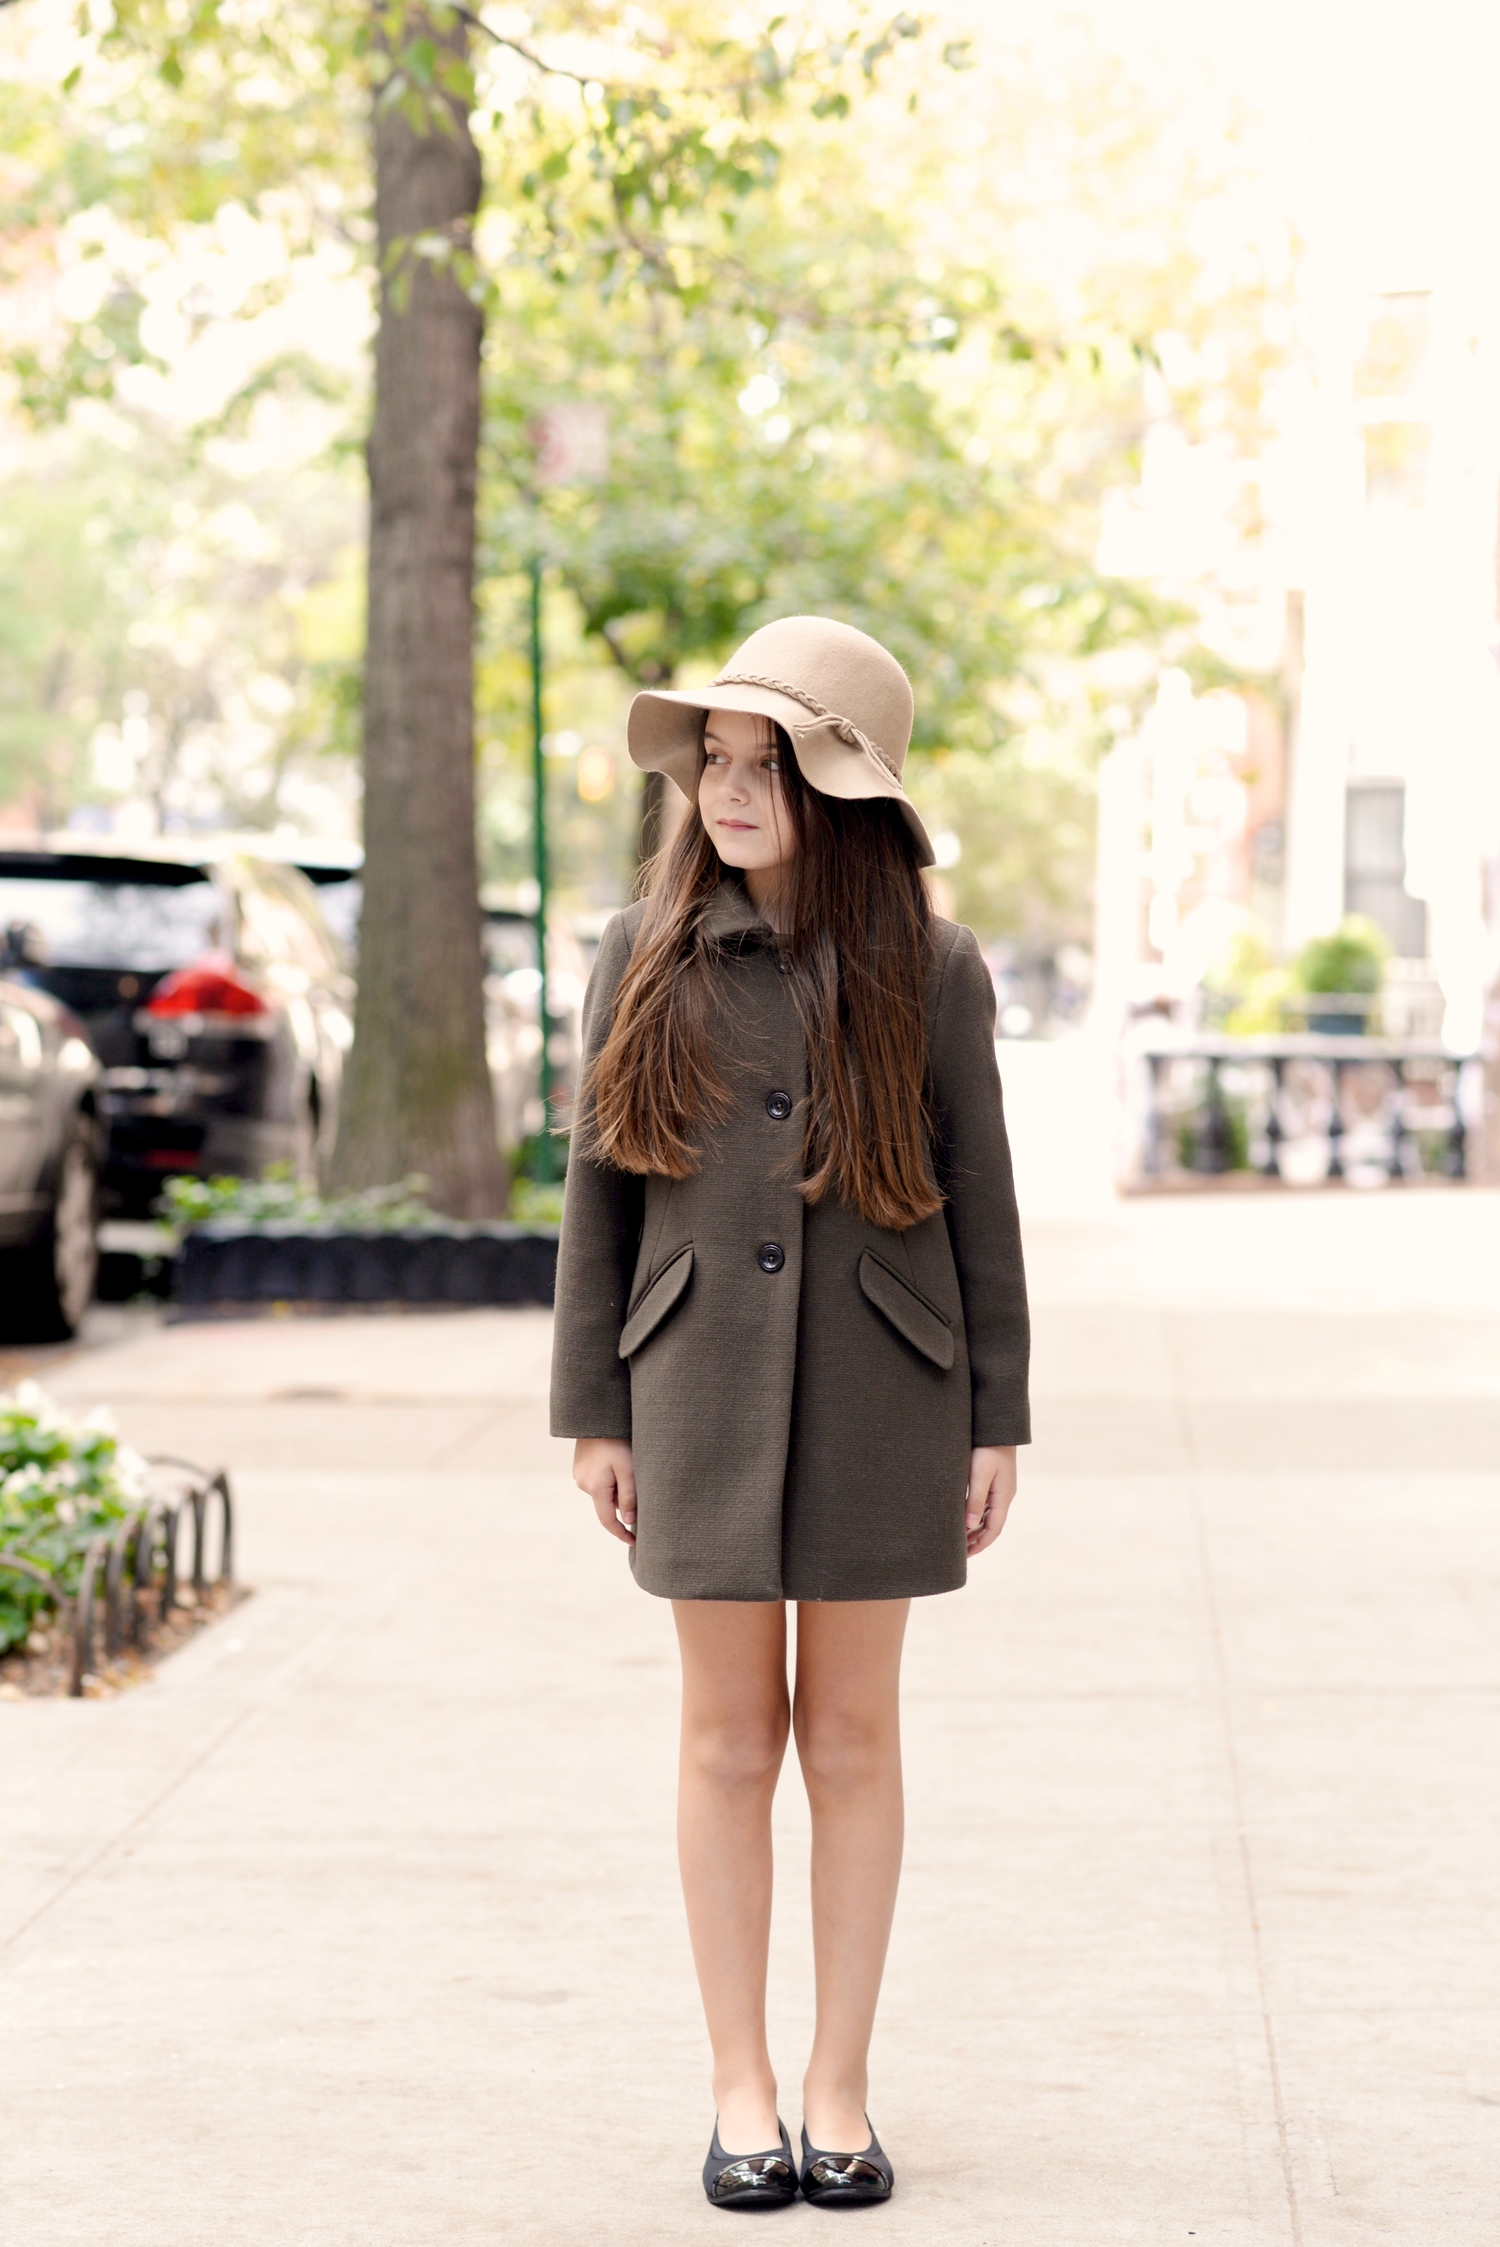 Enfant+Street+Style+by+Gina+Kim+Photography-40.jpeg